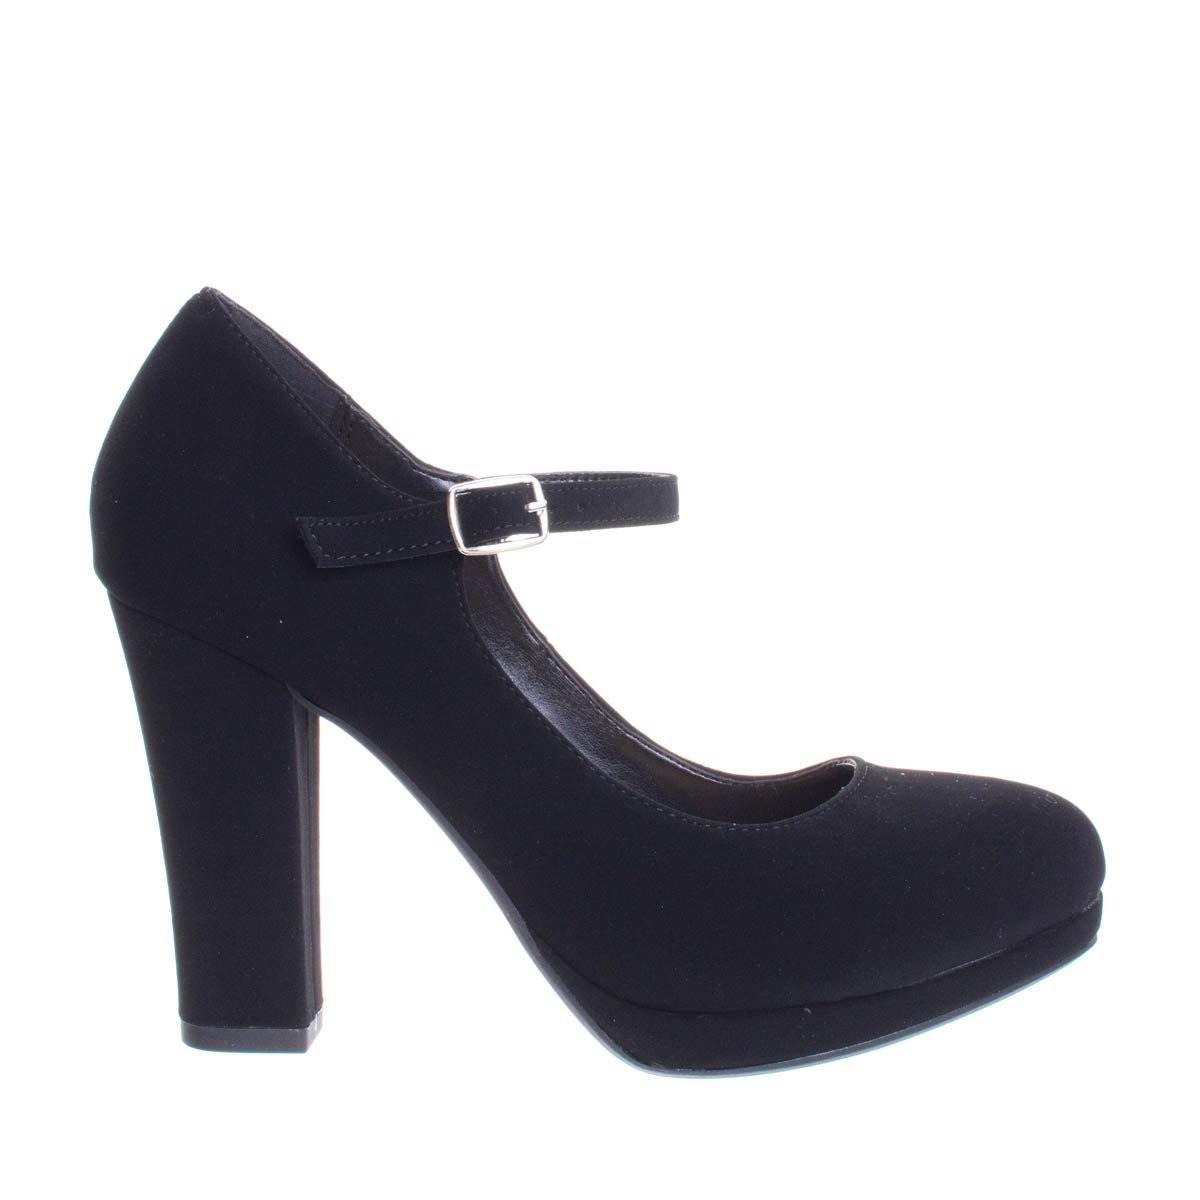 City Classified Ayden Black Nubuck Foam Padded Comfortable Mary-Jane Dress Pump, Chunky Block High Heel -8 by City Classified (Image #2)